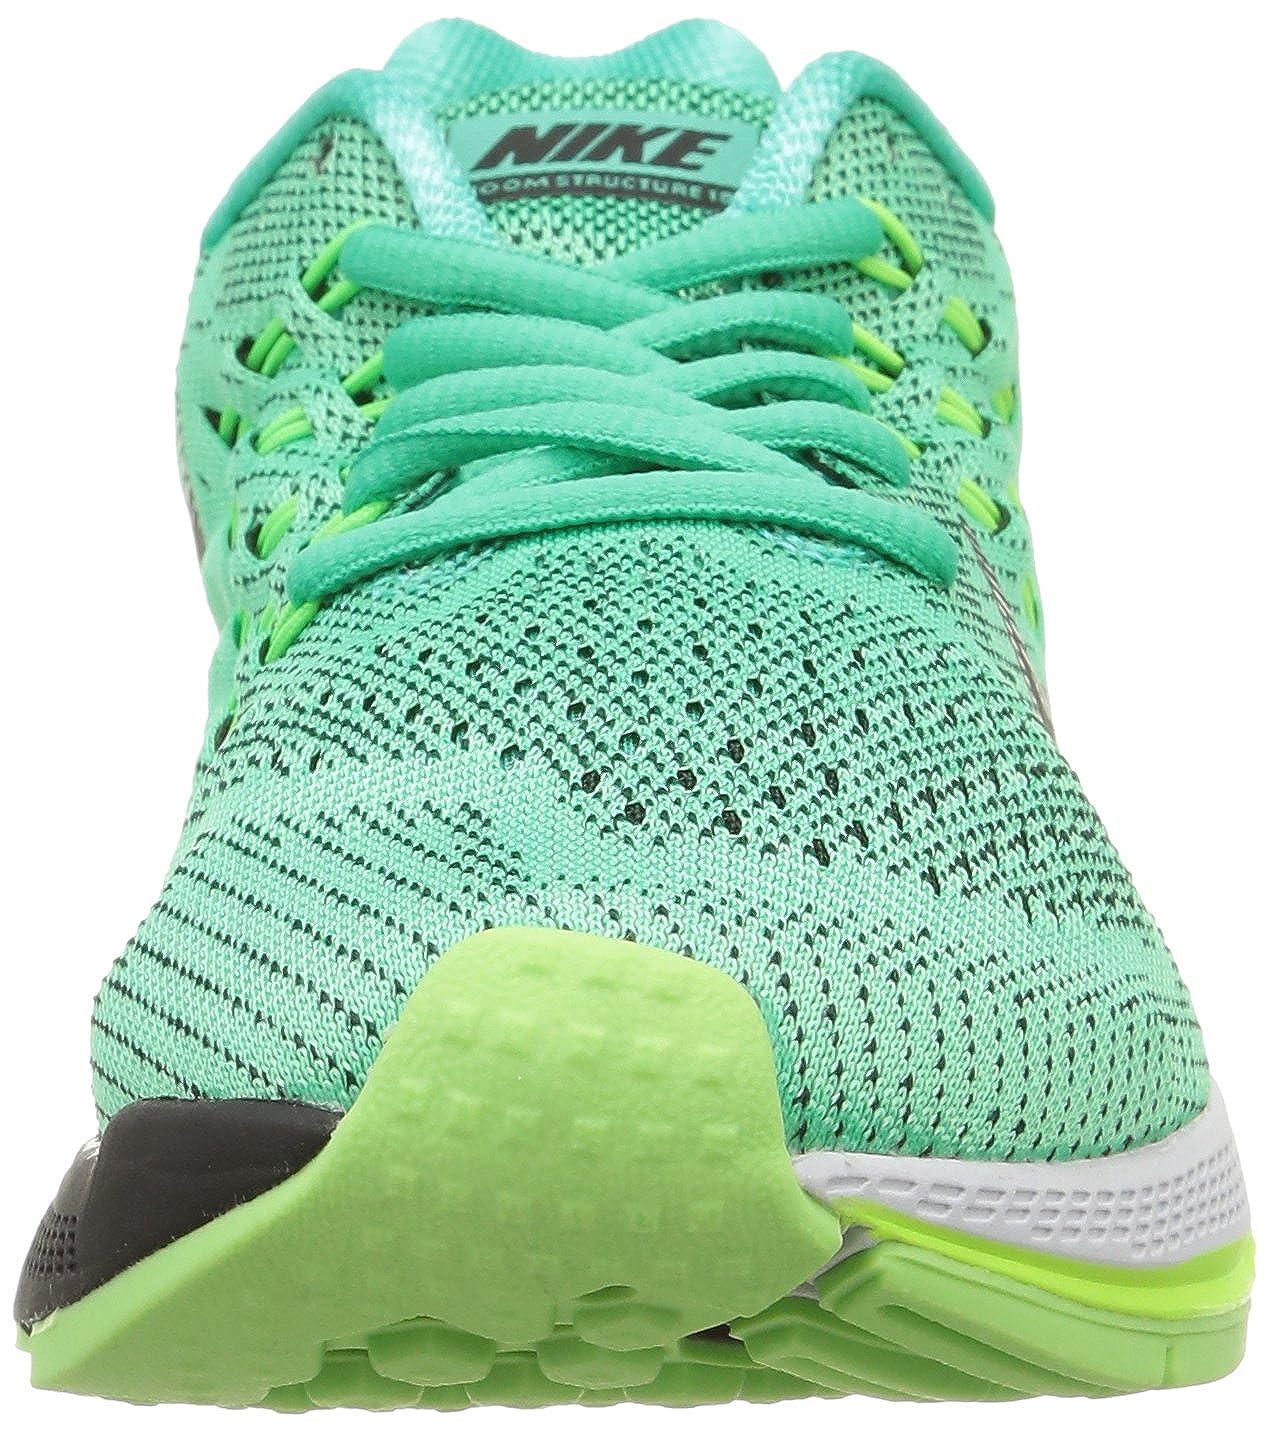 47629420de90 Nike Air Zoom Structure 18 Women s Fitness Shoes  Amazon.co.uk  Shoes   Bags